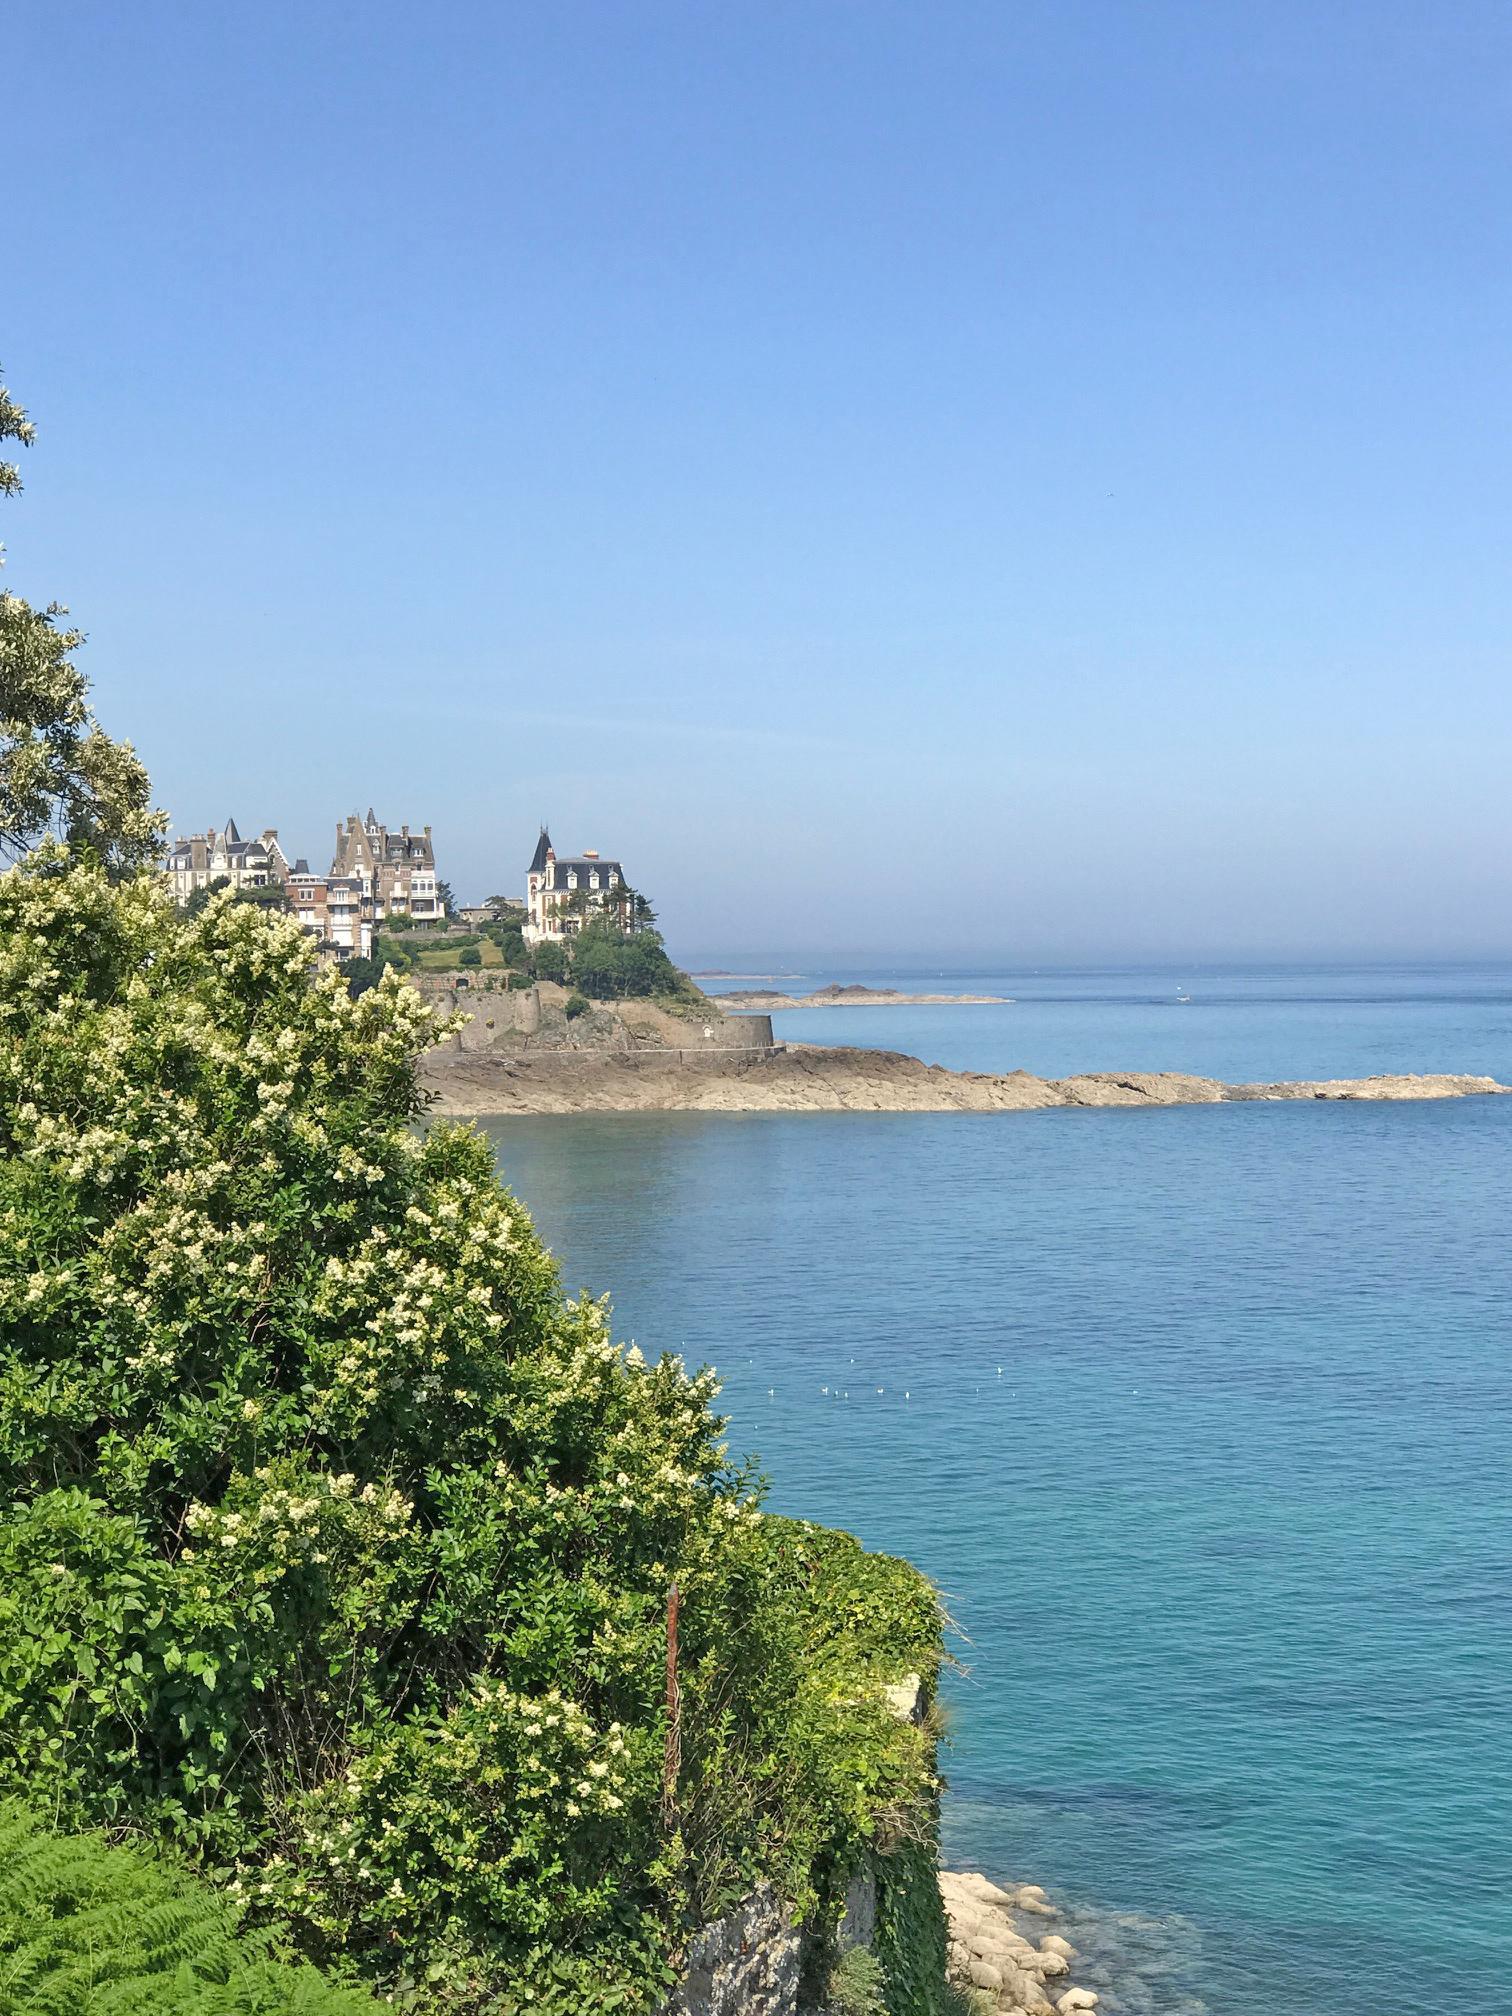 View from Castelbrac